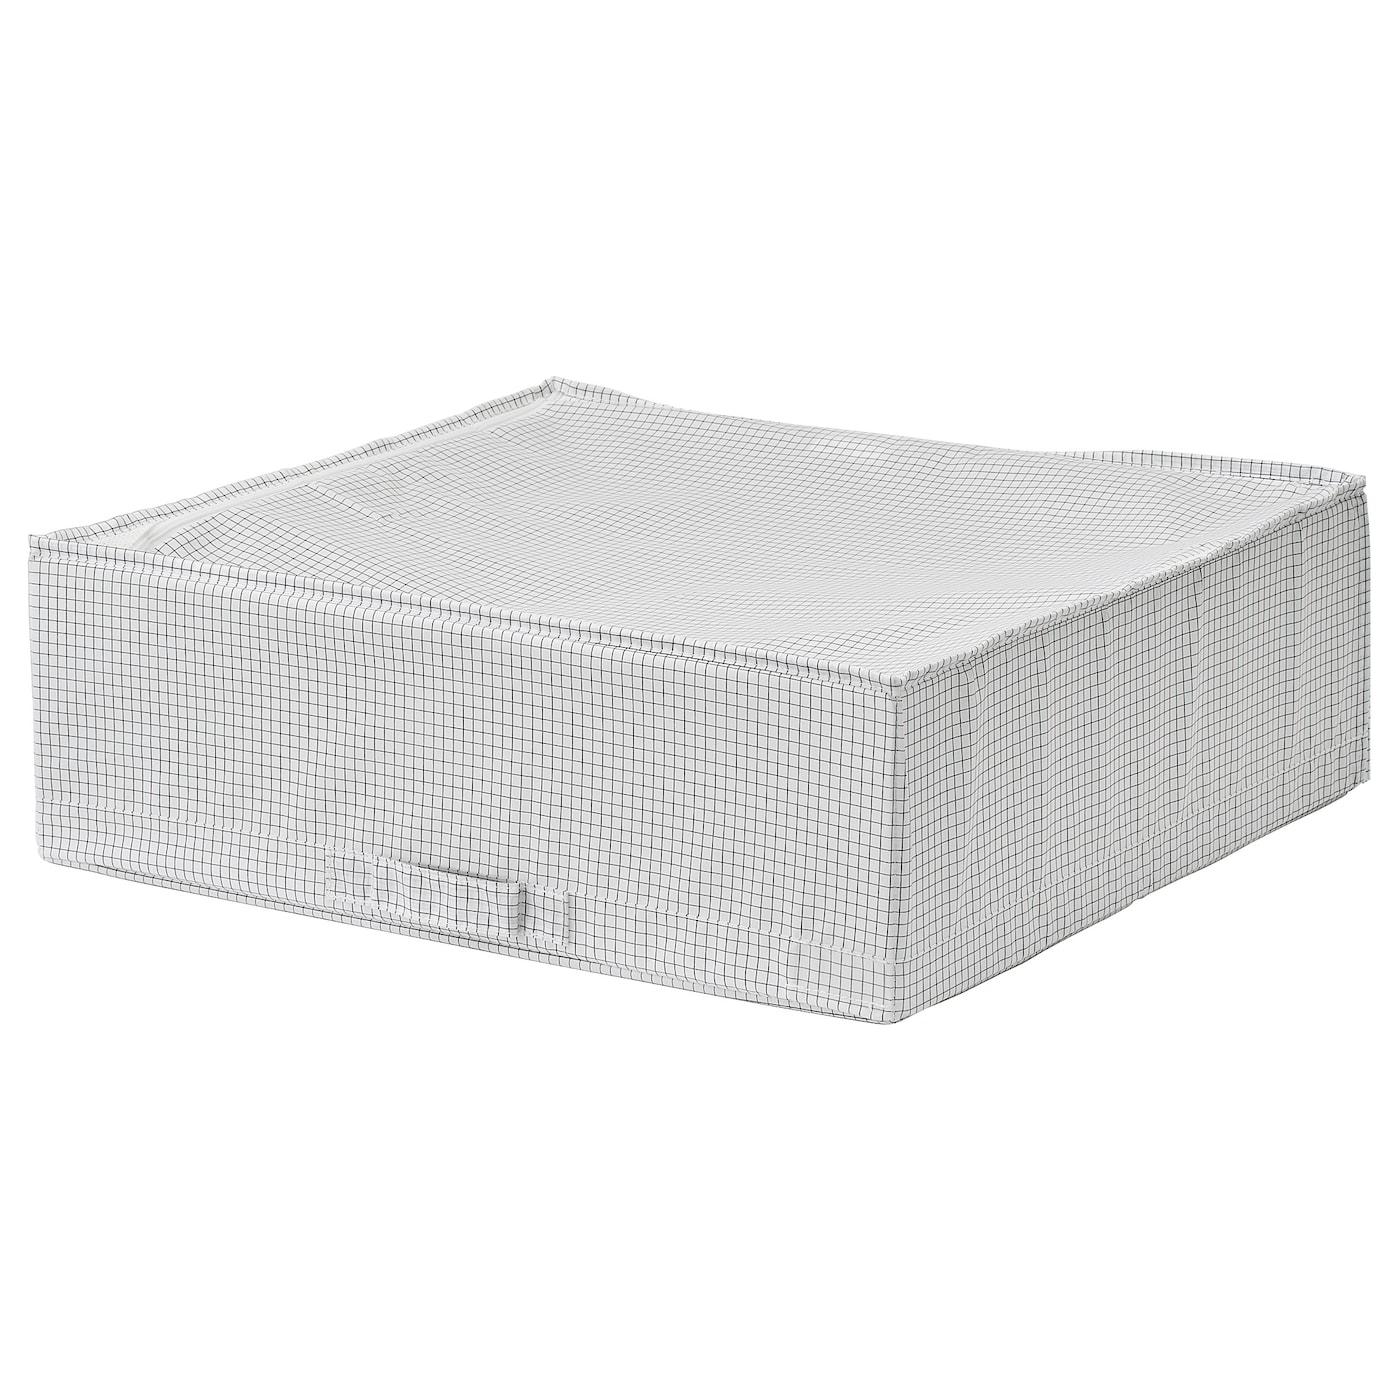 STUK Sac de rangement, blanc/gris, 55x51x18 cm - IKEA